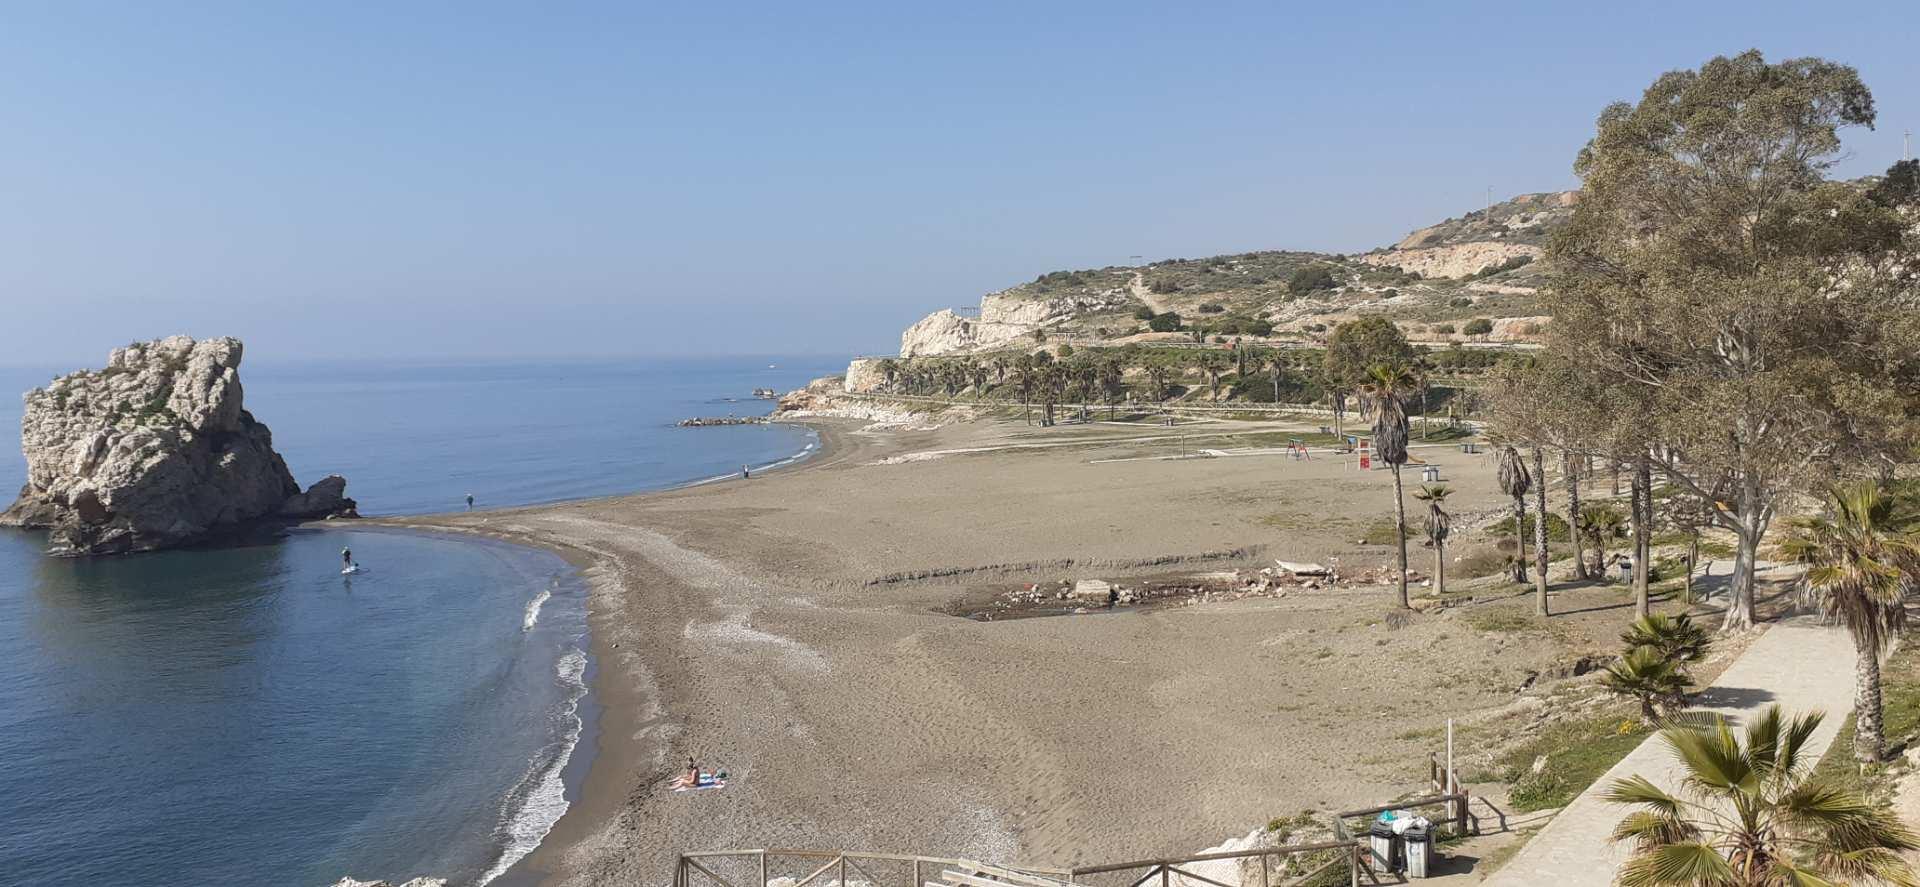 Playa Peñon del Cuervo